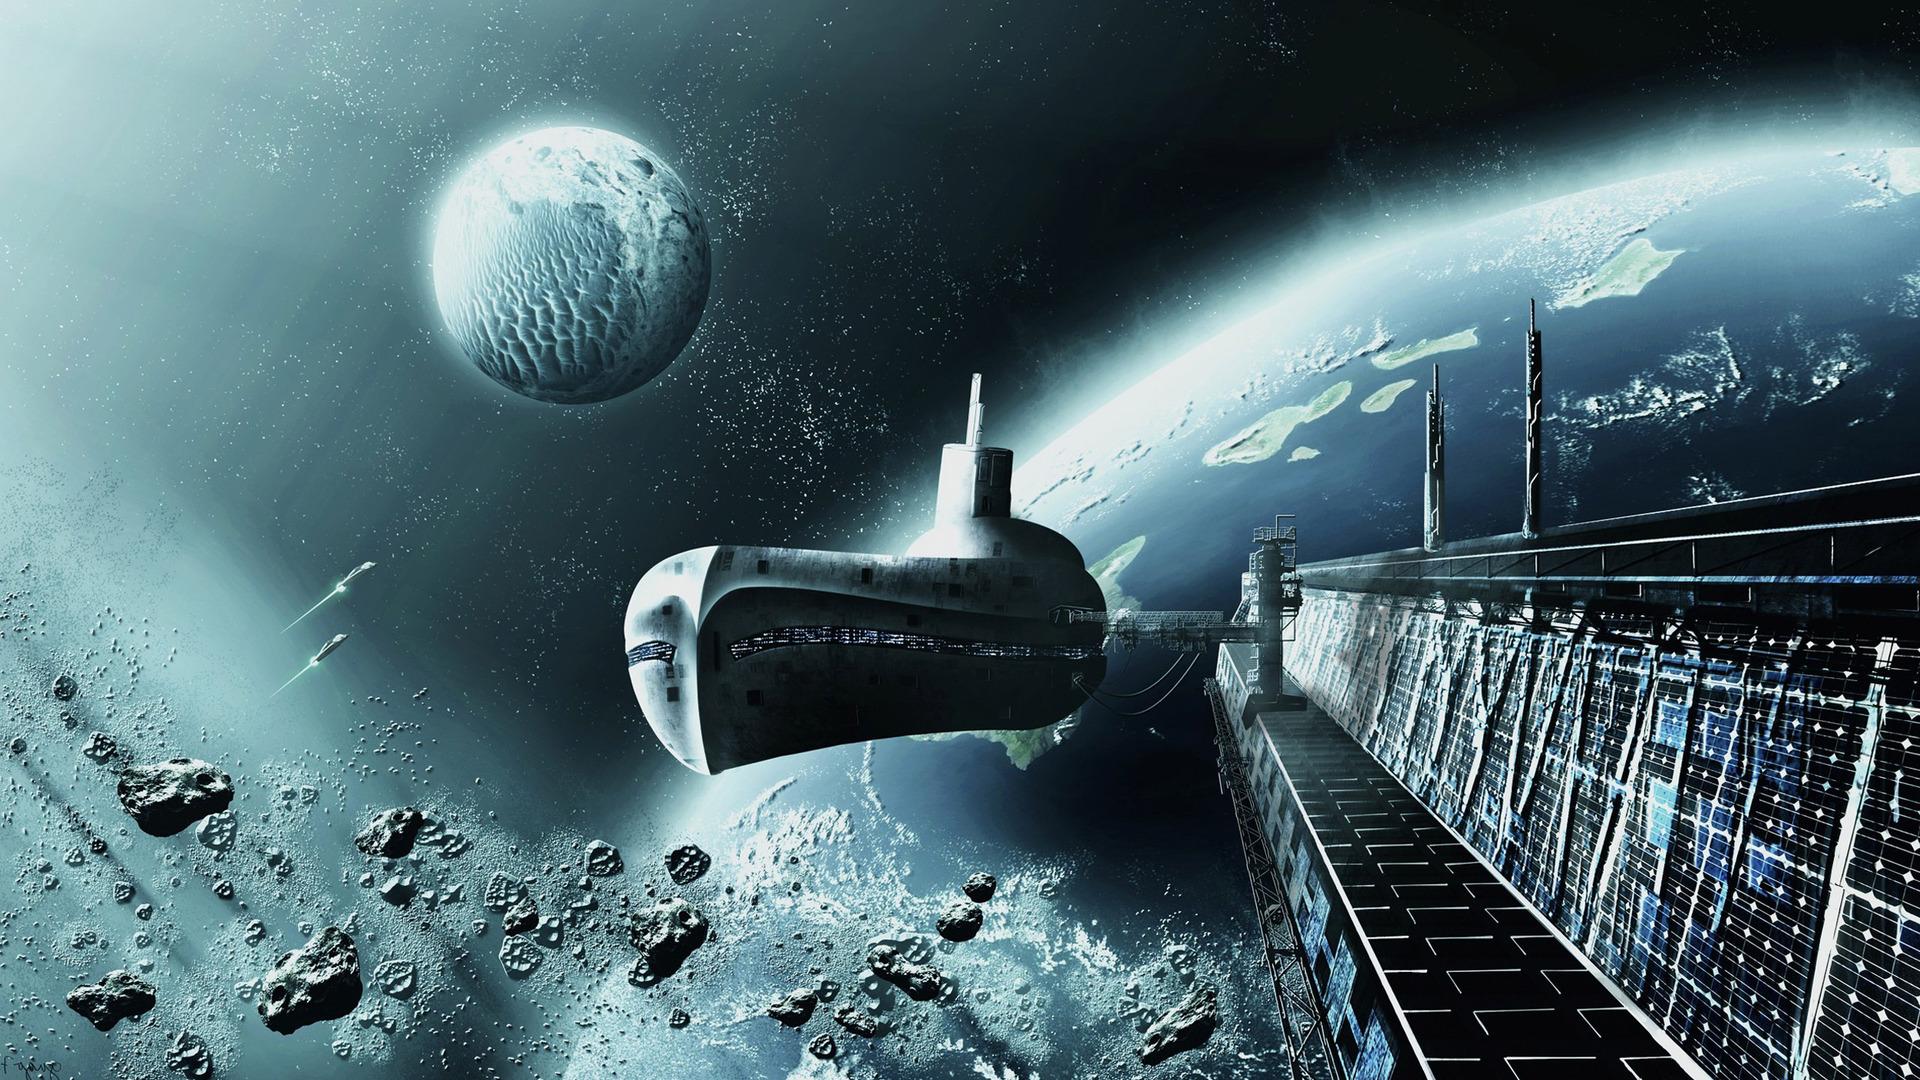 Download Submarine like spaceship wallpaper 1920x1080